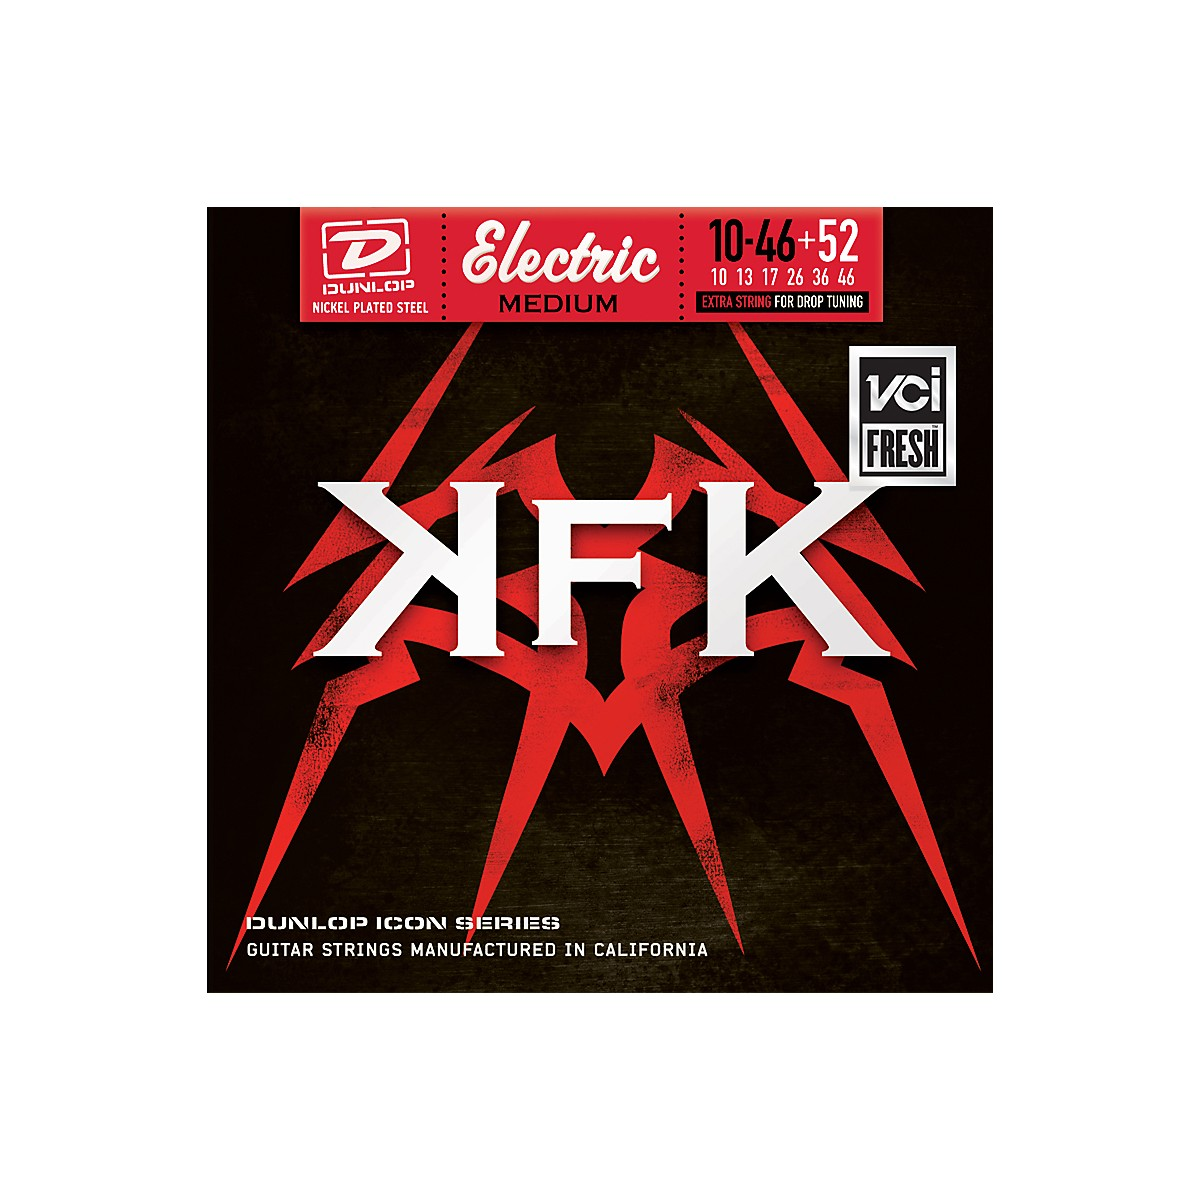 Dunlop Kerry King Drop Tuning Icon Series Signature Set